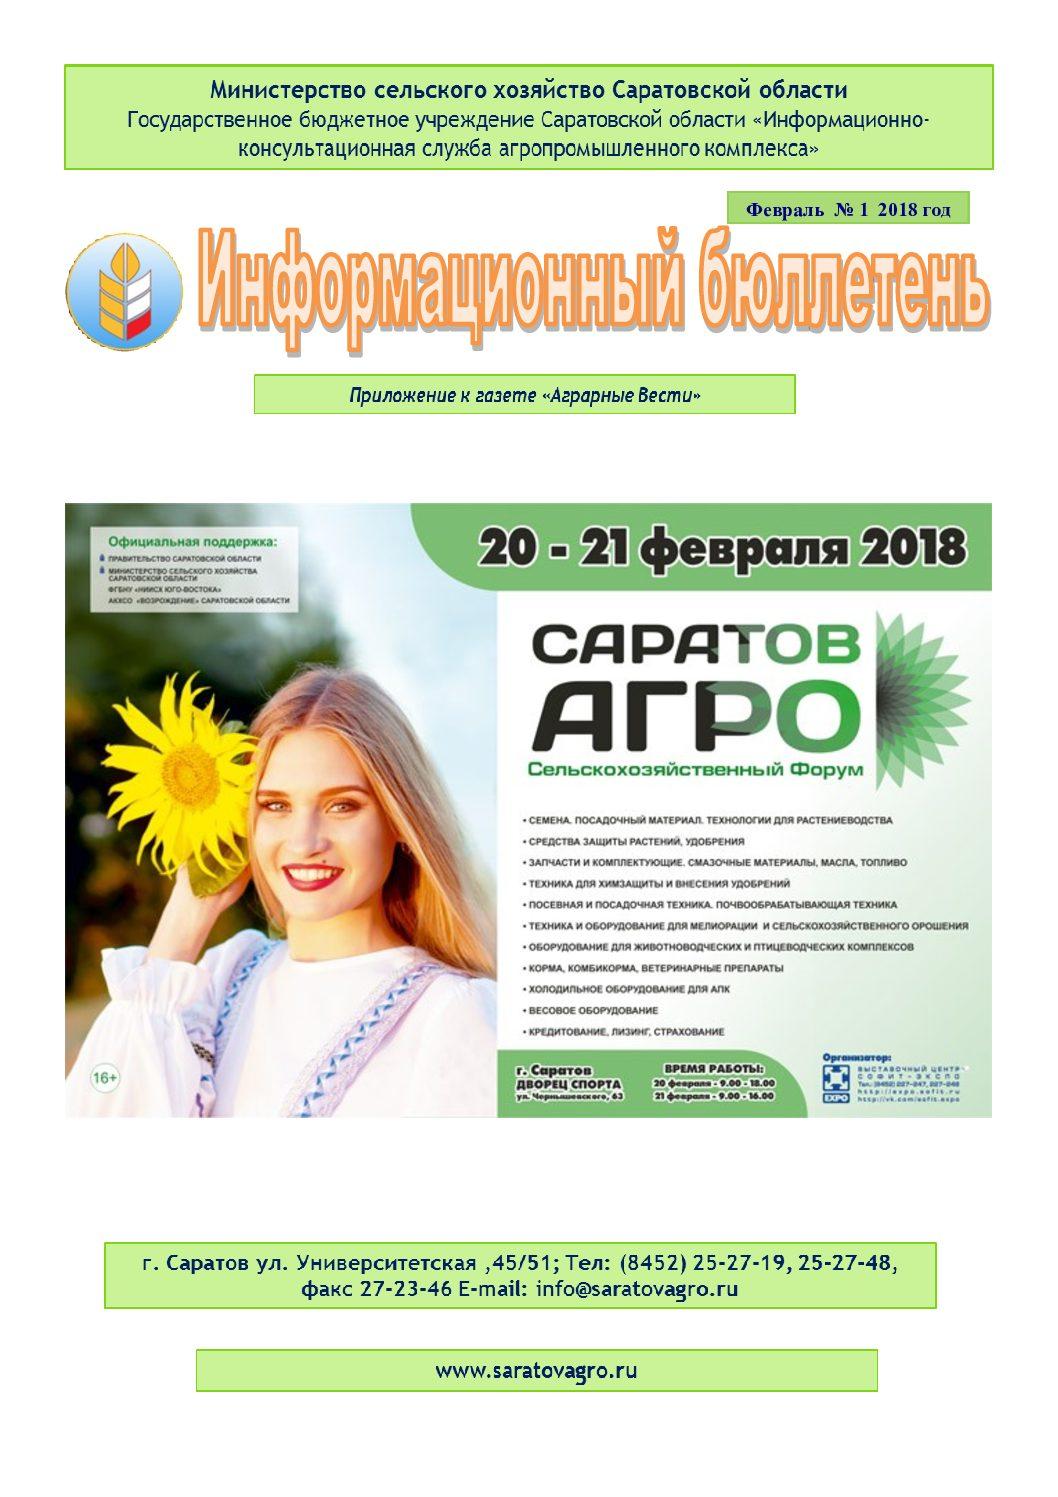 https://saratovagro.ru/wp-content/uploads/2020/08/1.2018-1-pdf.jpg